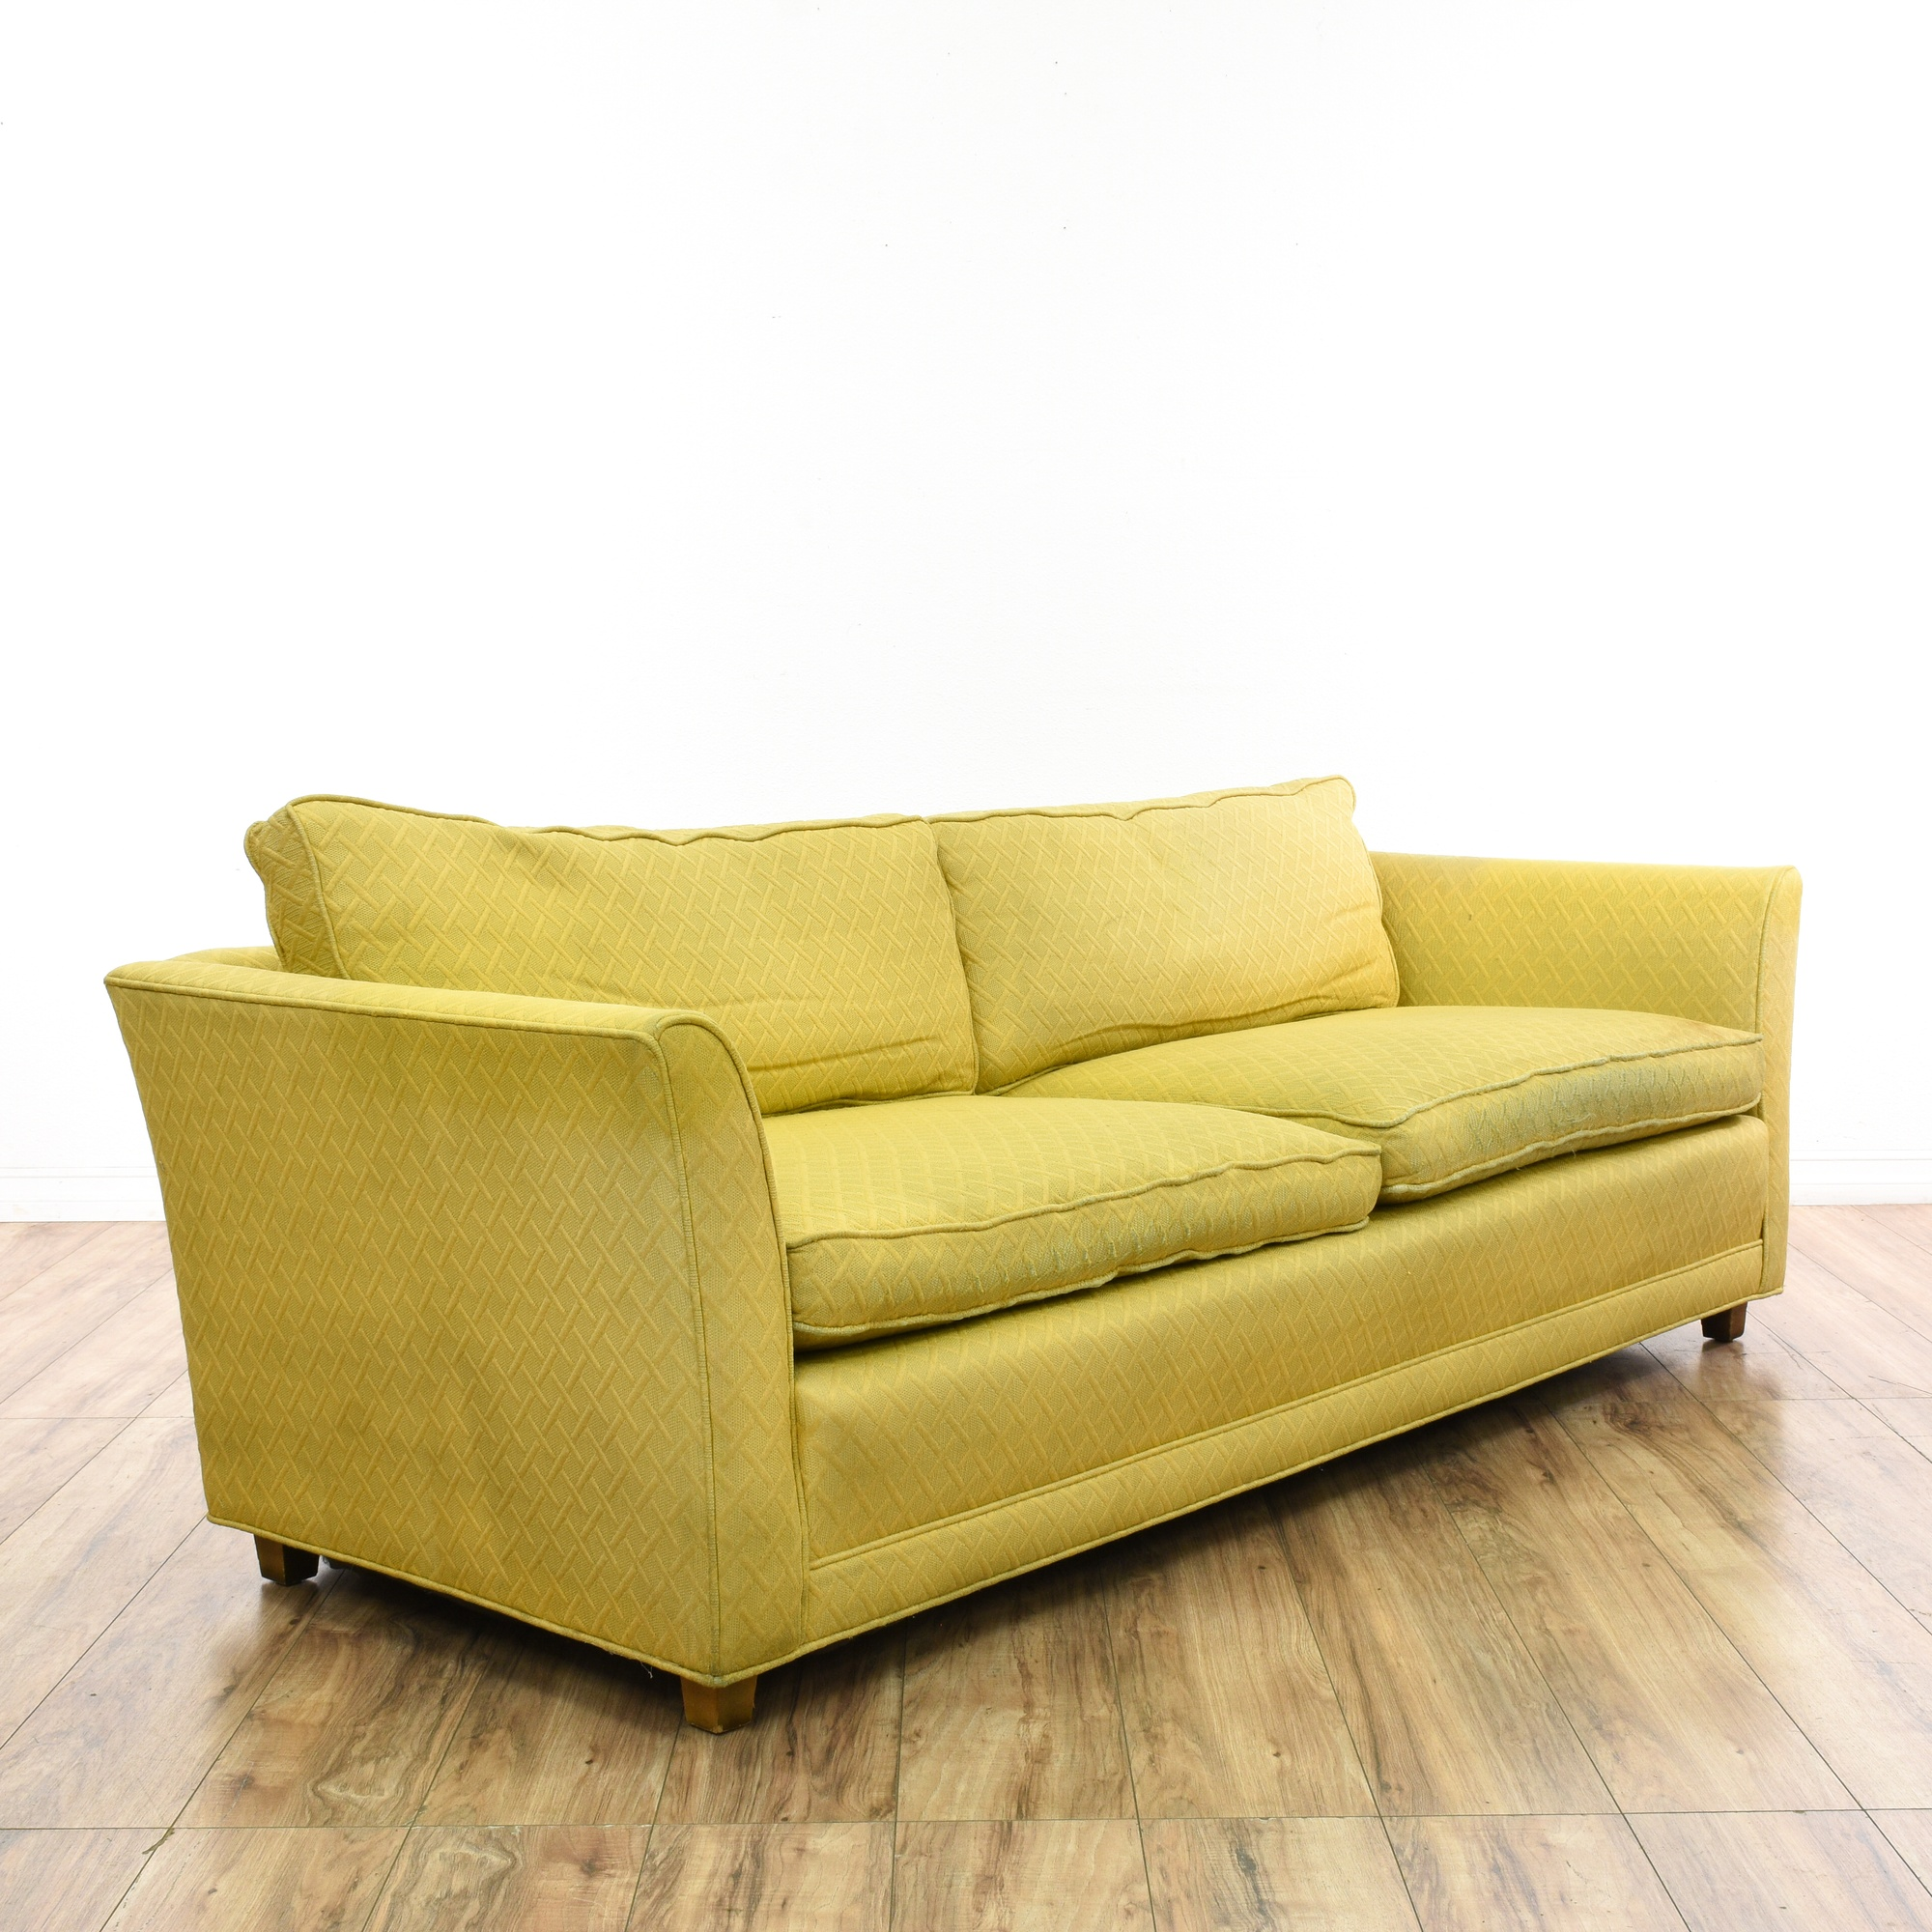 Yellow Upholstered Mid Century Modern Sofa